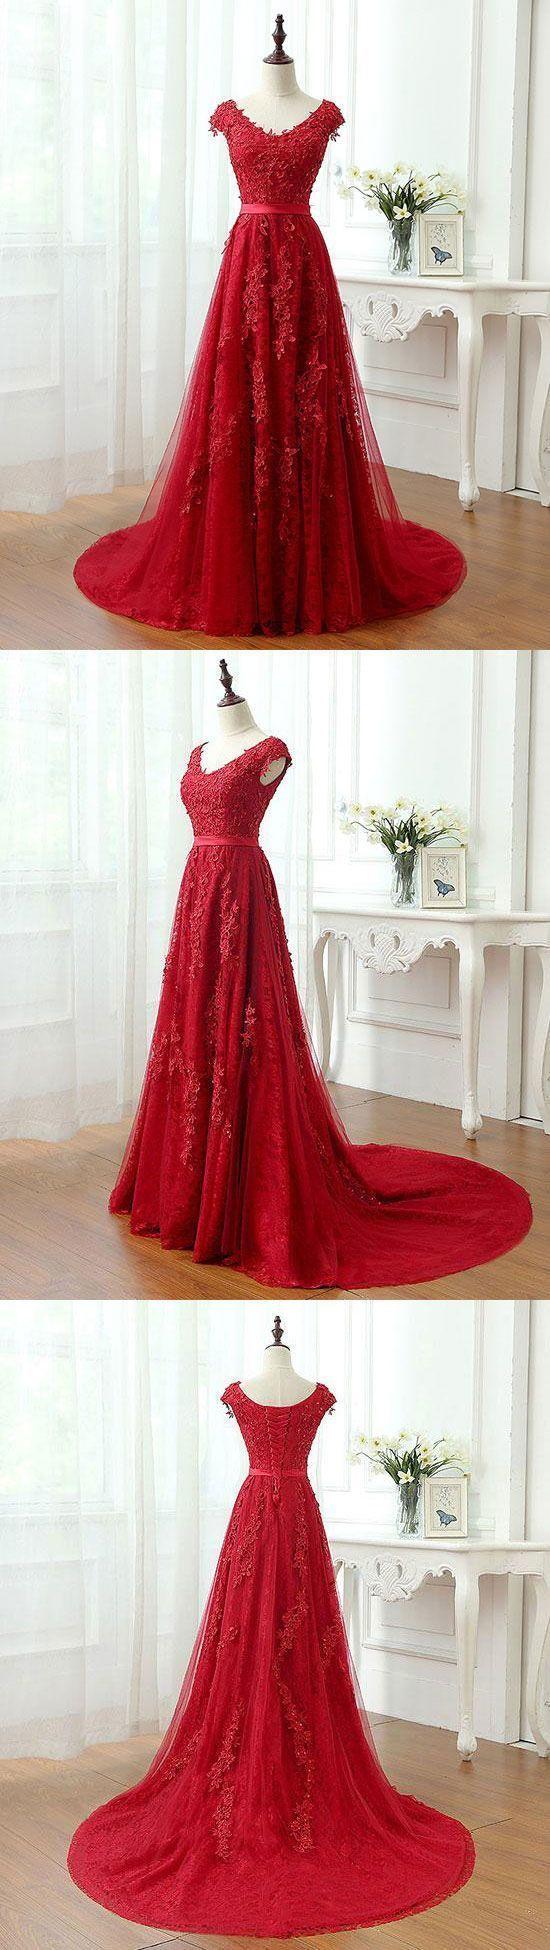 Elegant Appliques A-Line Prom Dresses,Long Prom Dresses,Cheap Prom Dresses,